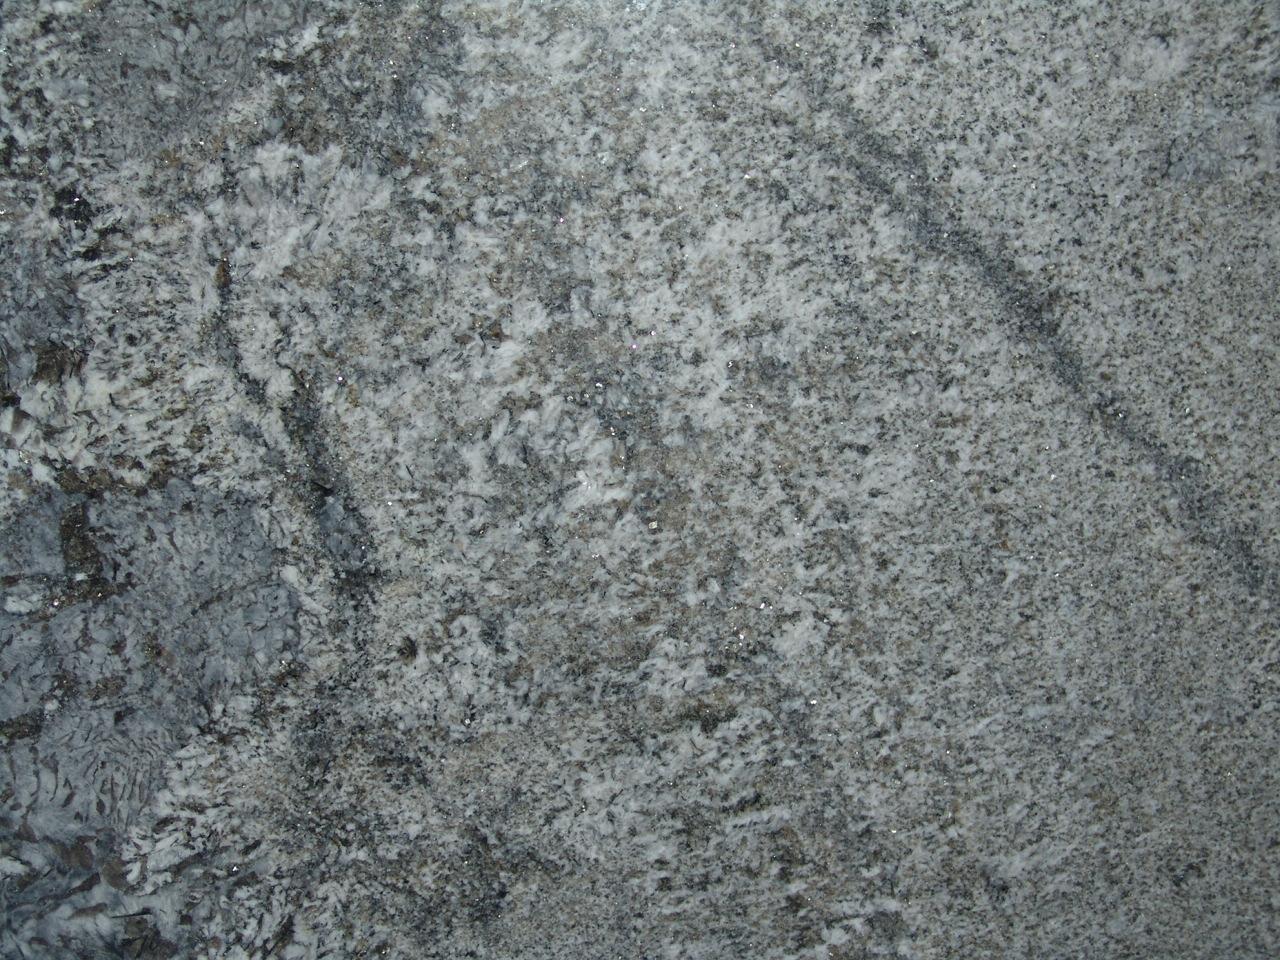 Yellow Moon Granite : Image picture photo of granites emerald pearl